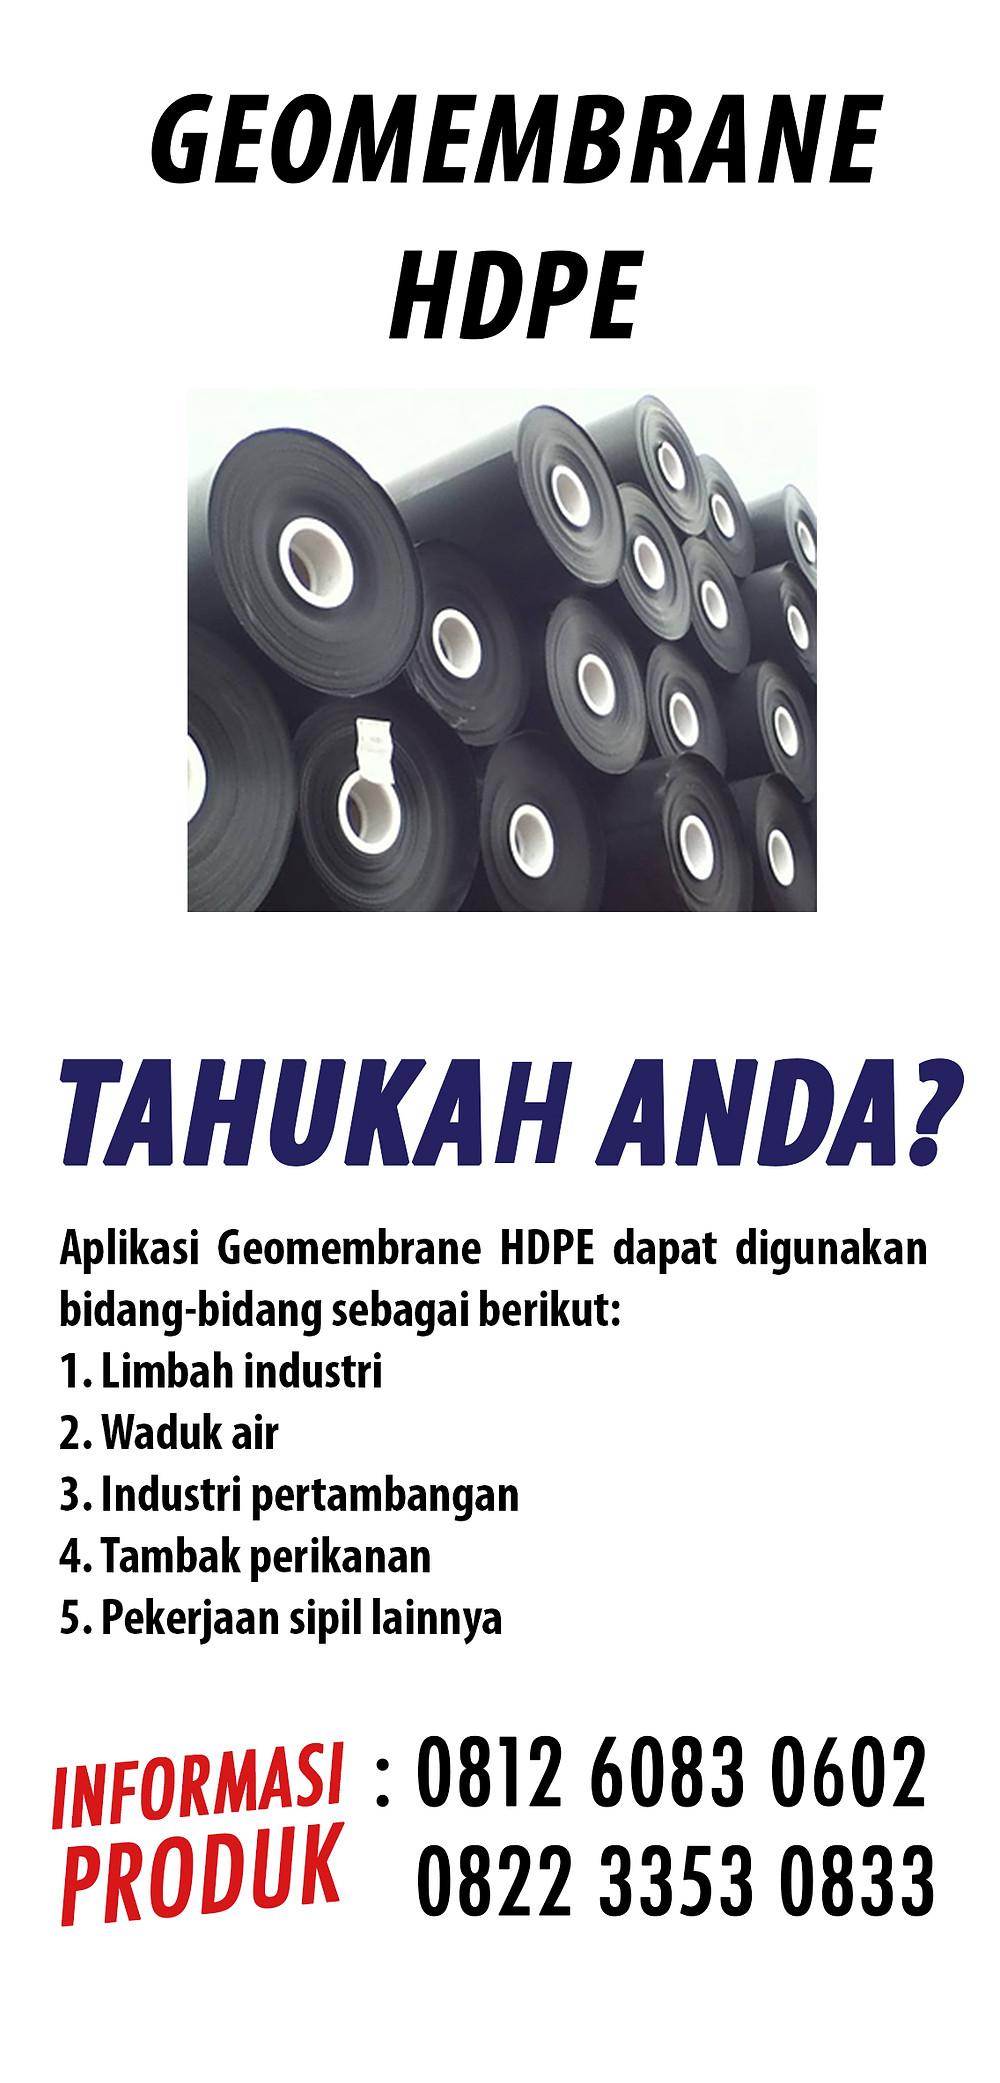 jual Geombrane HDPE tambak